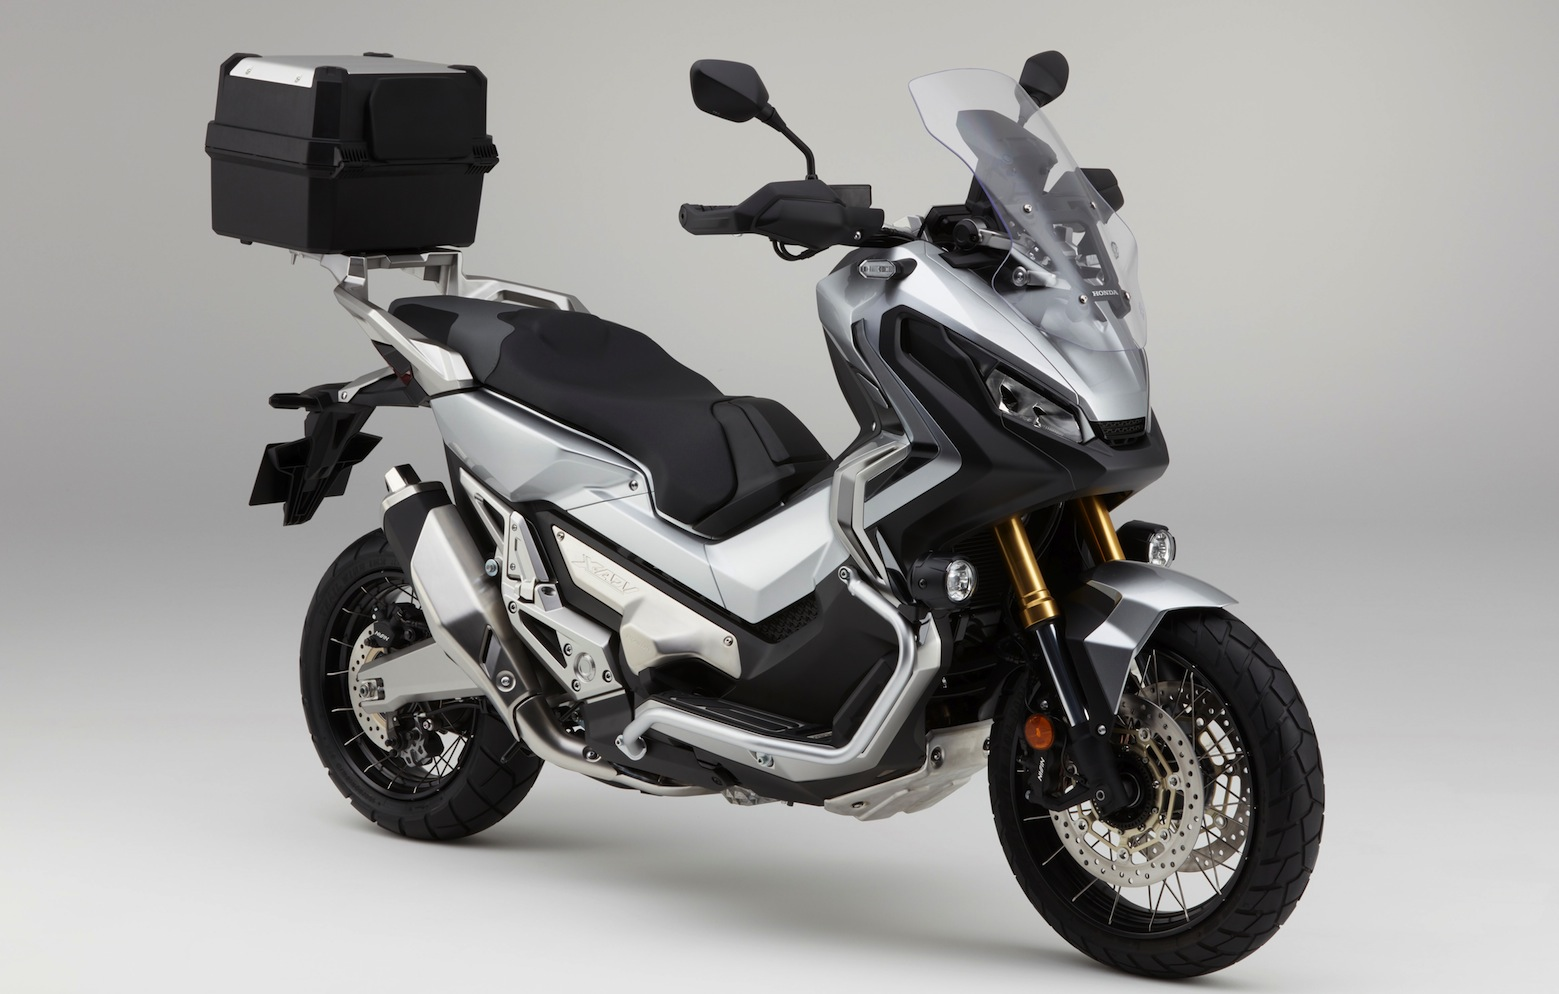 moto senza marce honda idea di immagine del motociclo. Black Bedroom Furniture Sets. Home Design Ideas